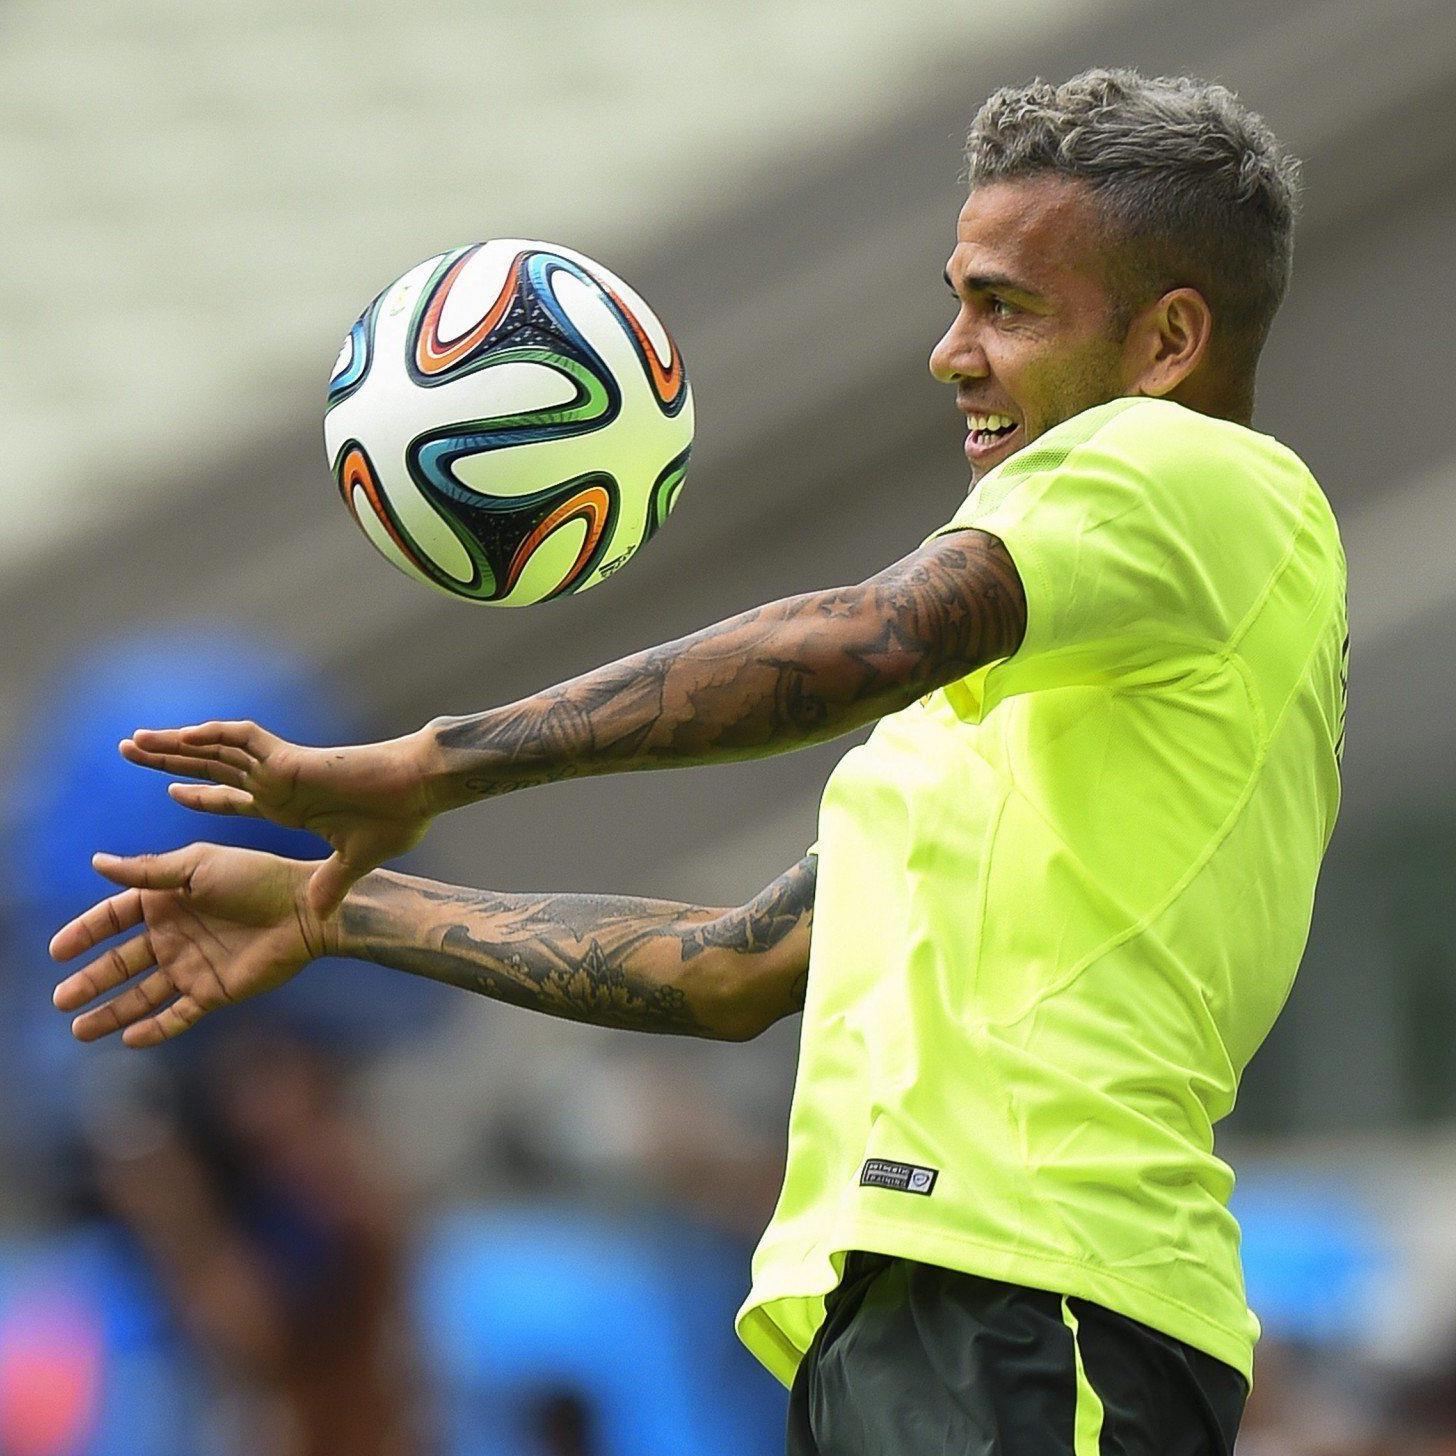 Brasilien hofft auch gegen Mexiko auf den Doppel-Torschützen aus dem Kroatien-Spiel Neymar.